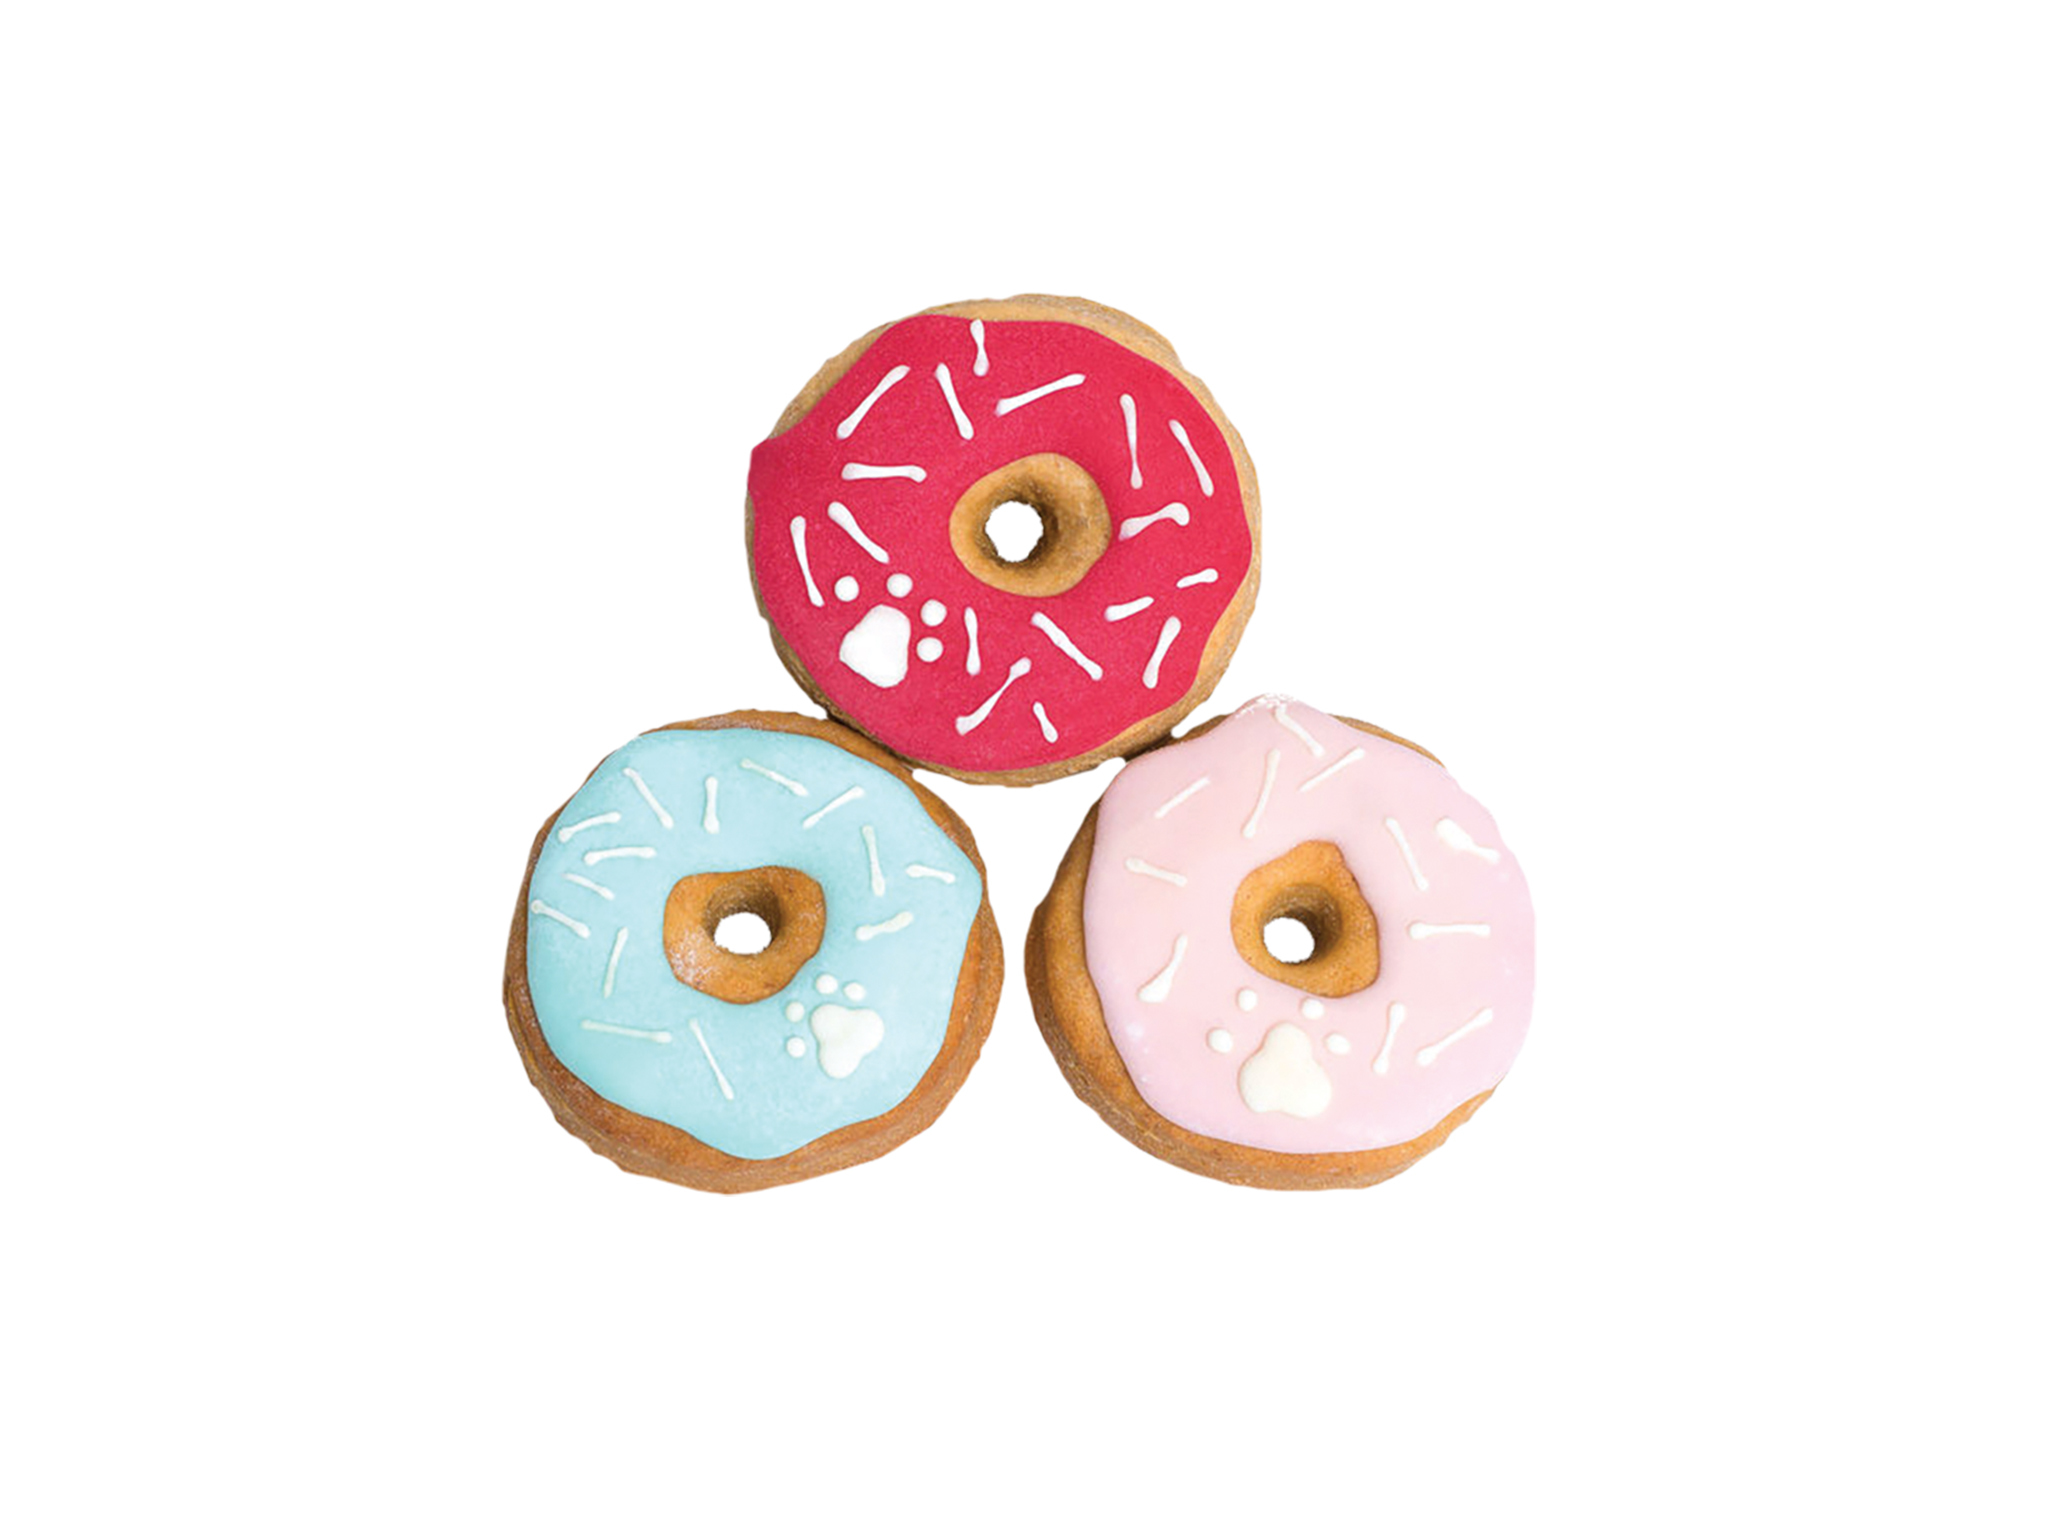 Presentes para Animais, Shopping Natal 2020, Dognuts, Rossi Pets Bakery